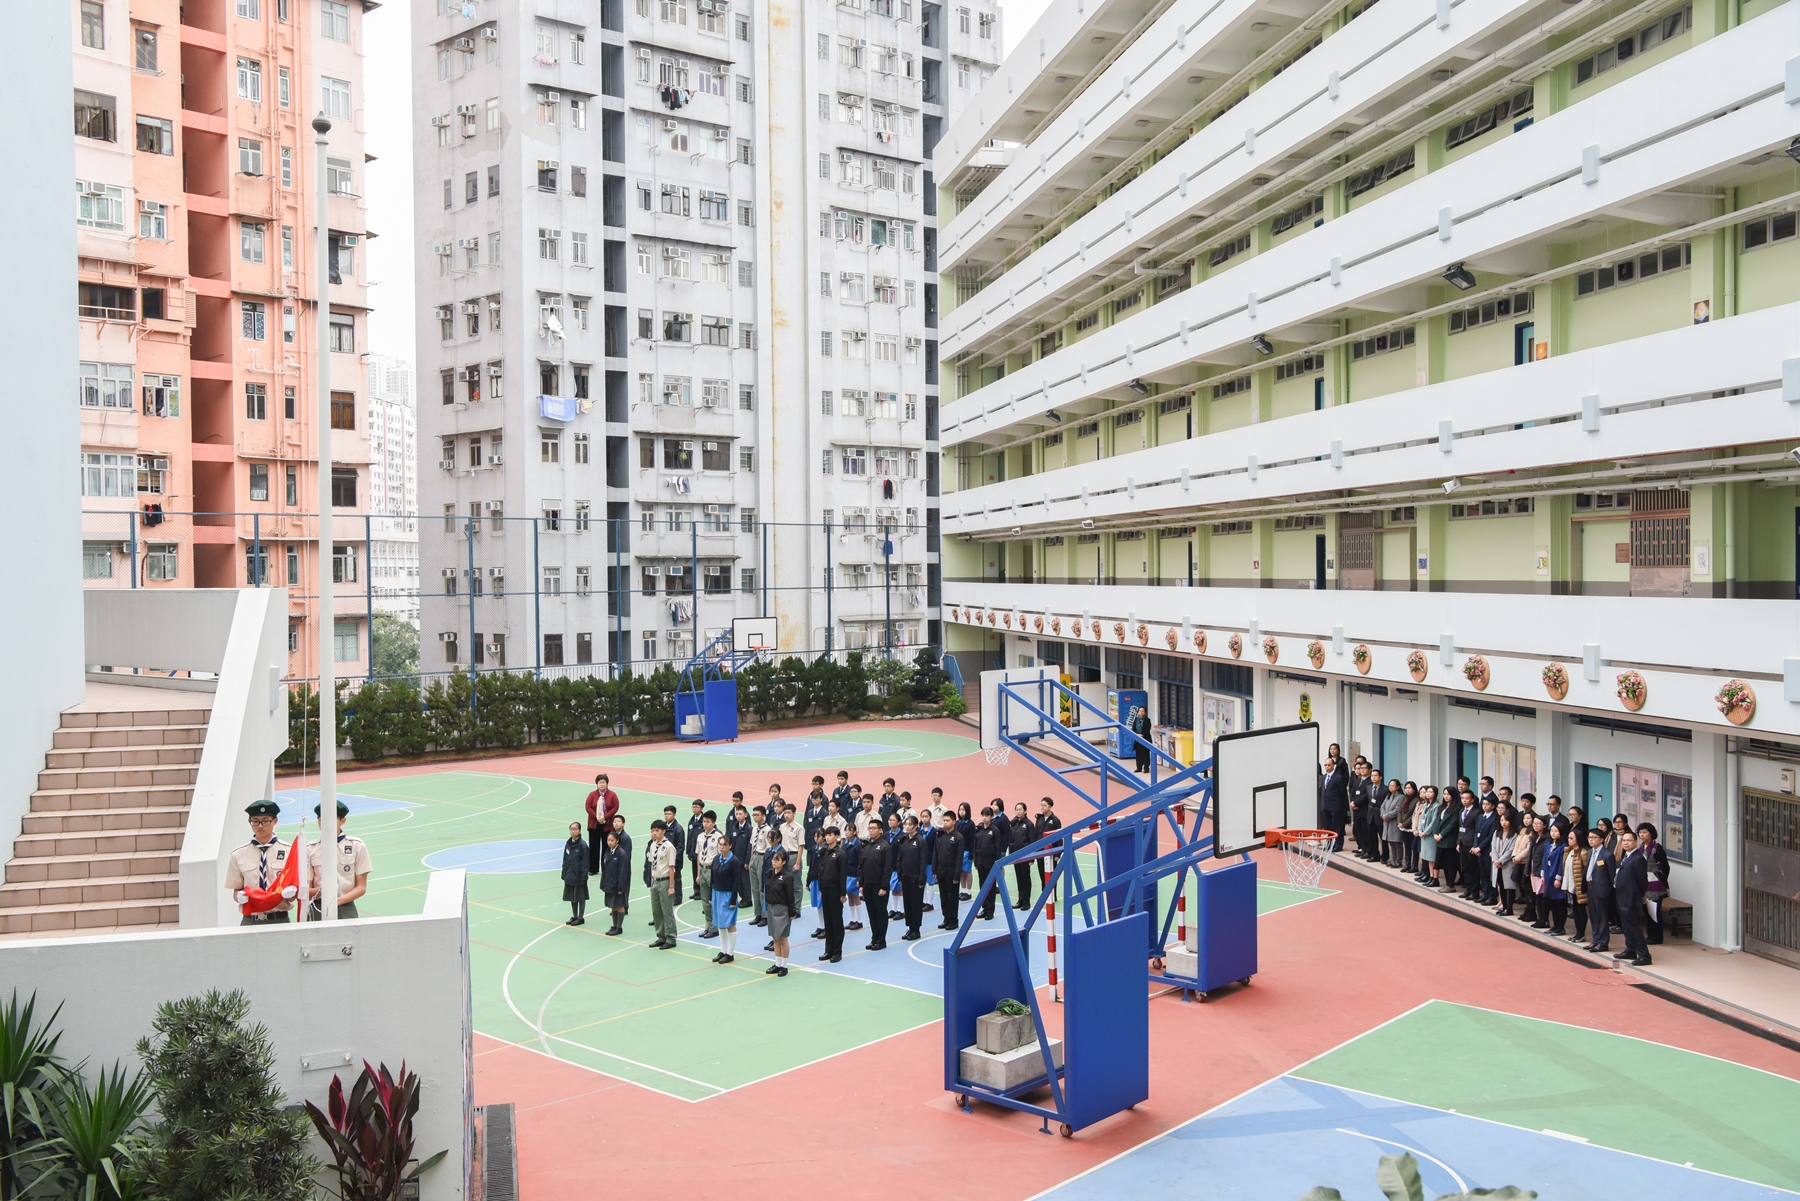 http://npc.edu.hk/sites/default/files/dsc_3331.jpg